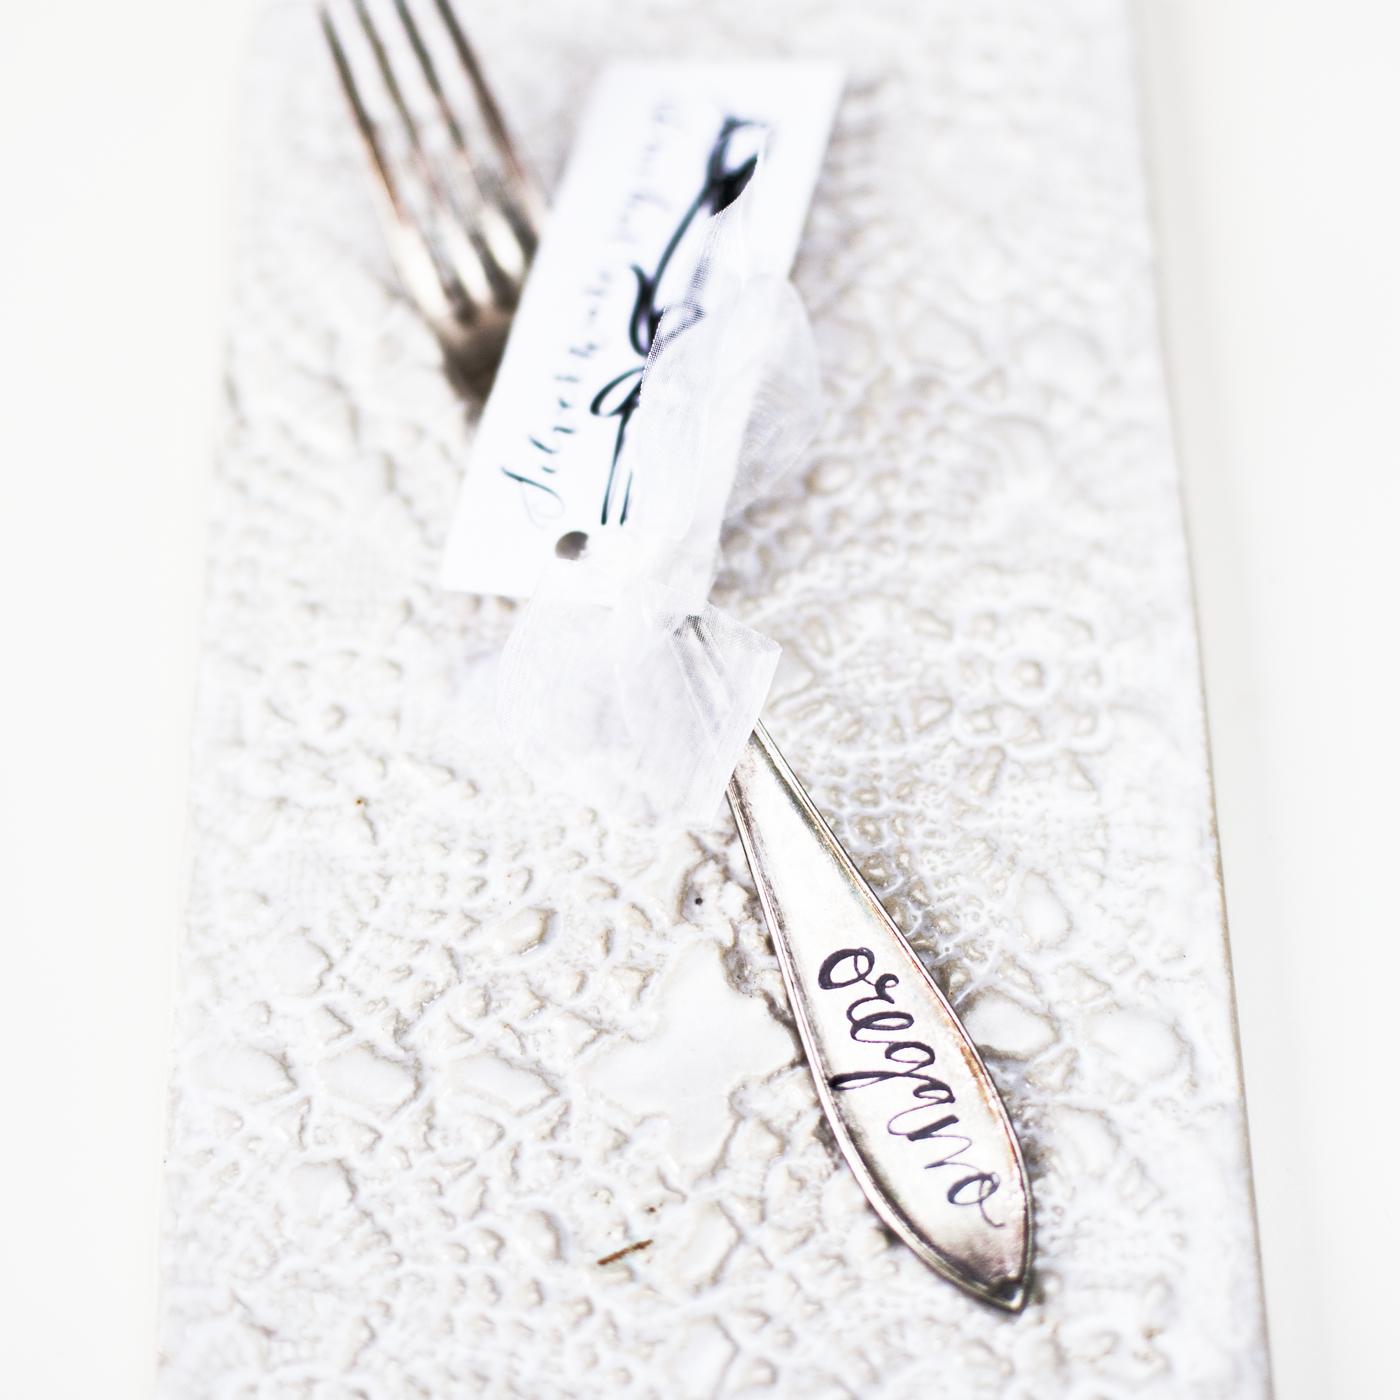 Oregano (fork)